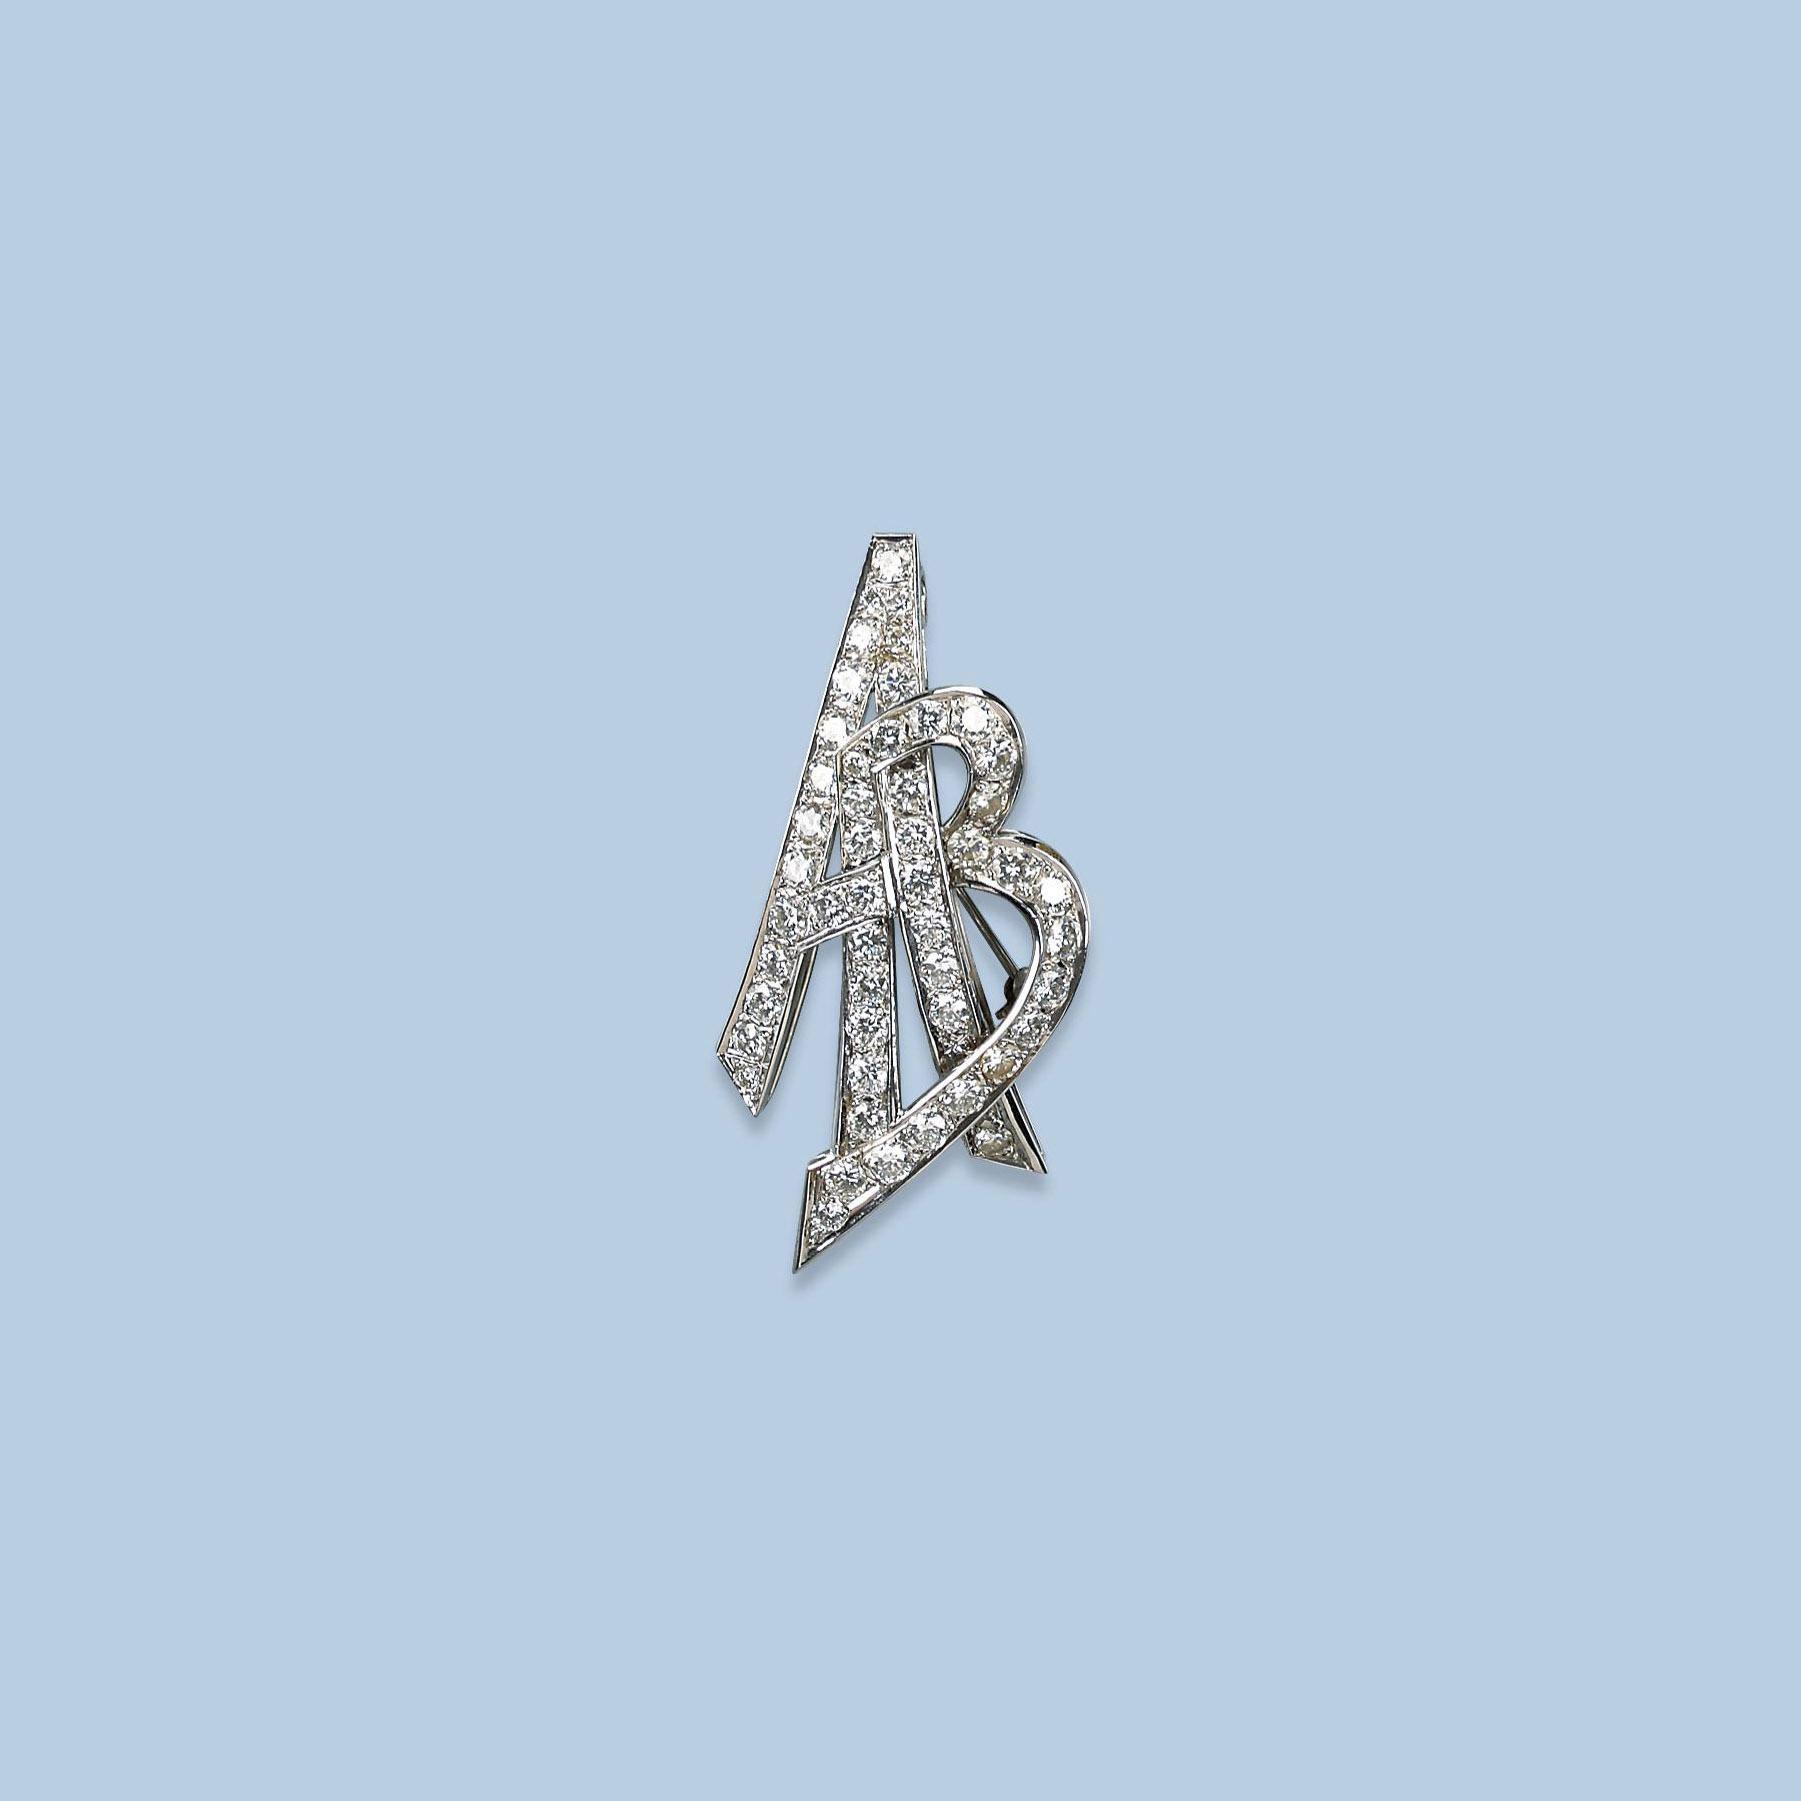 A DIAMOND MONOGRAM BROOCH